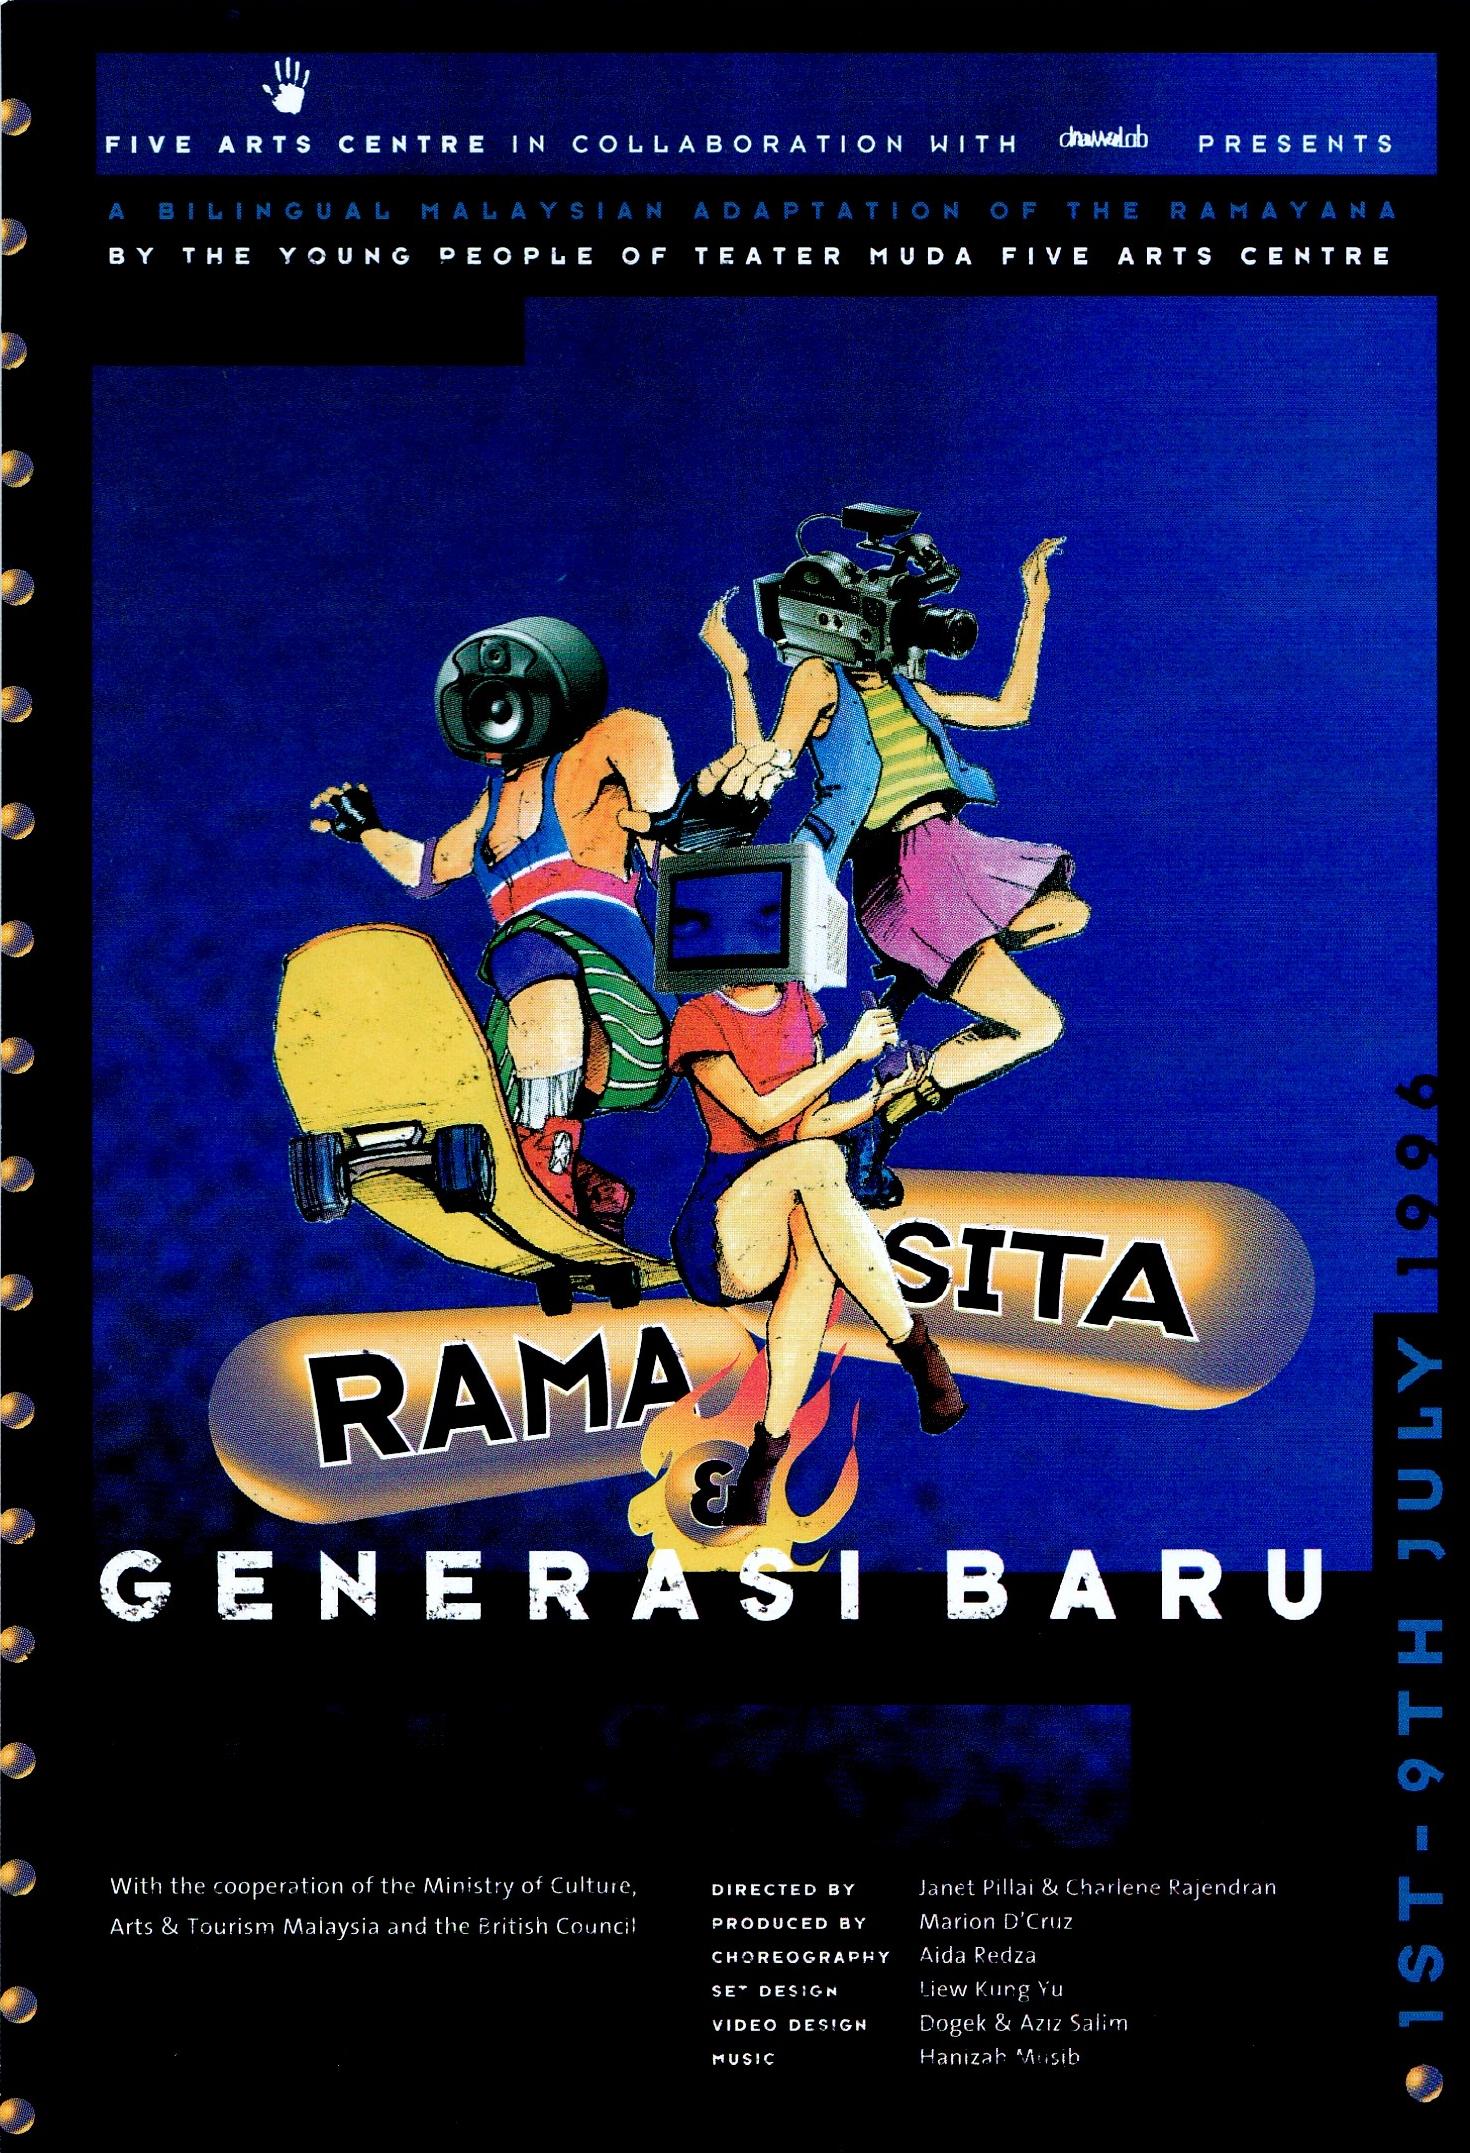 Rama dan Sita - Flier front